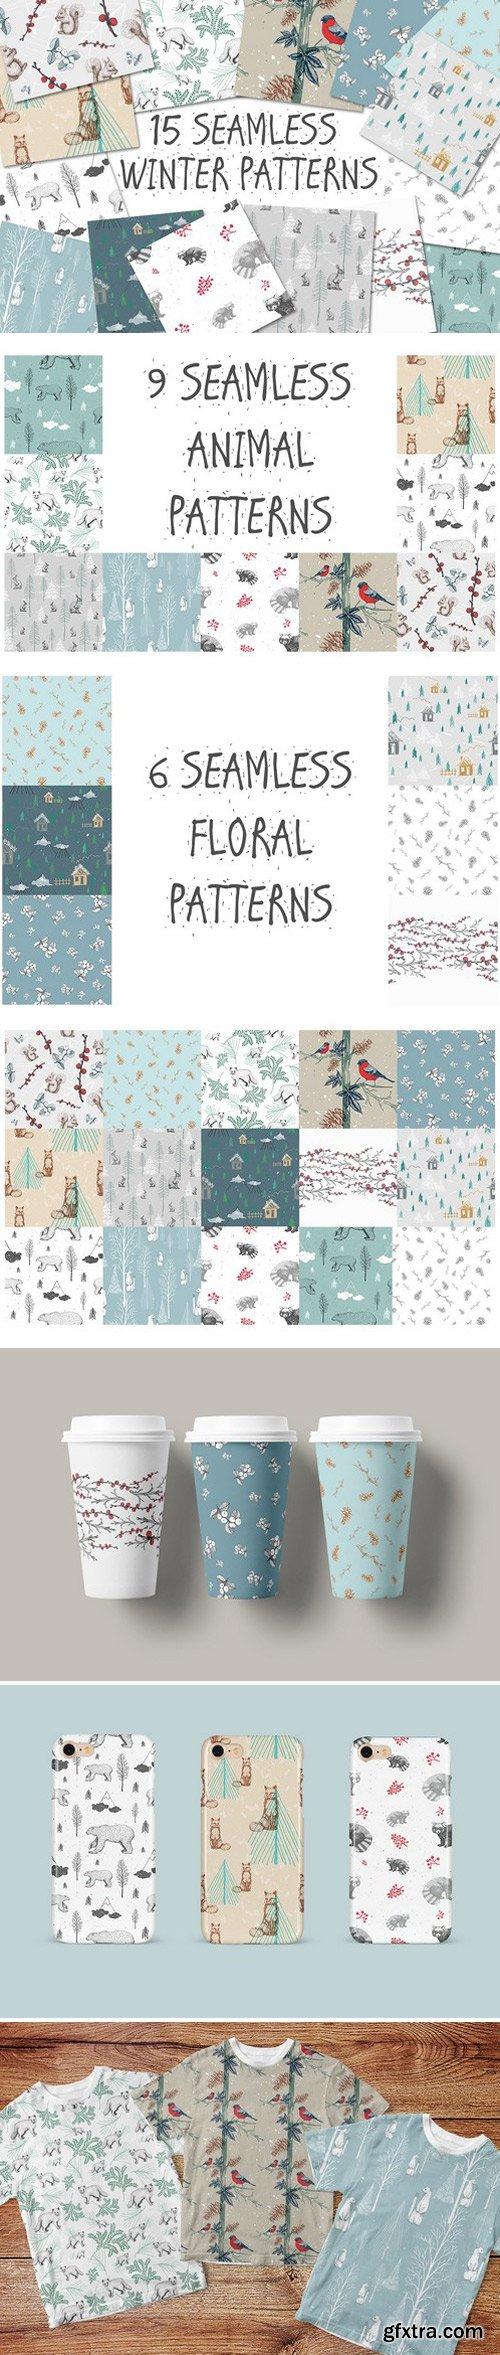 15 Seamless Winter Patterns